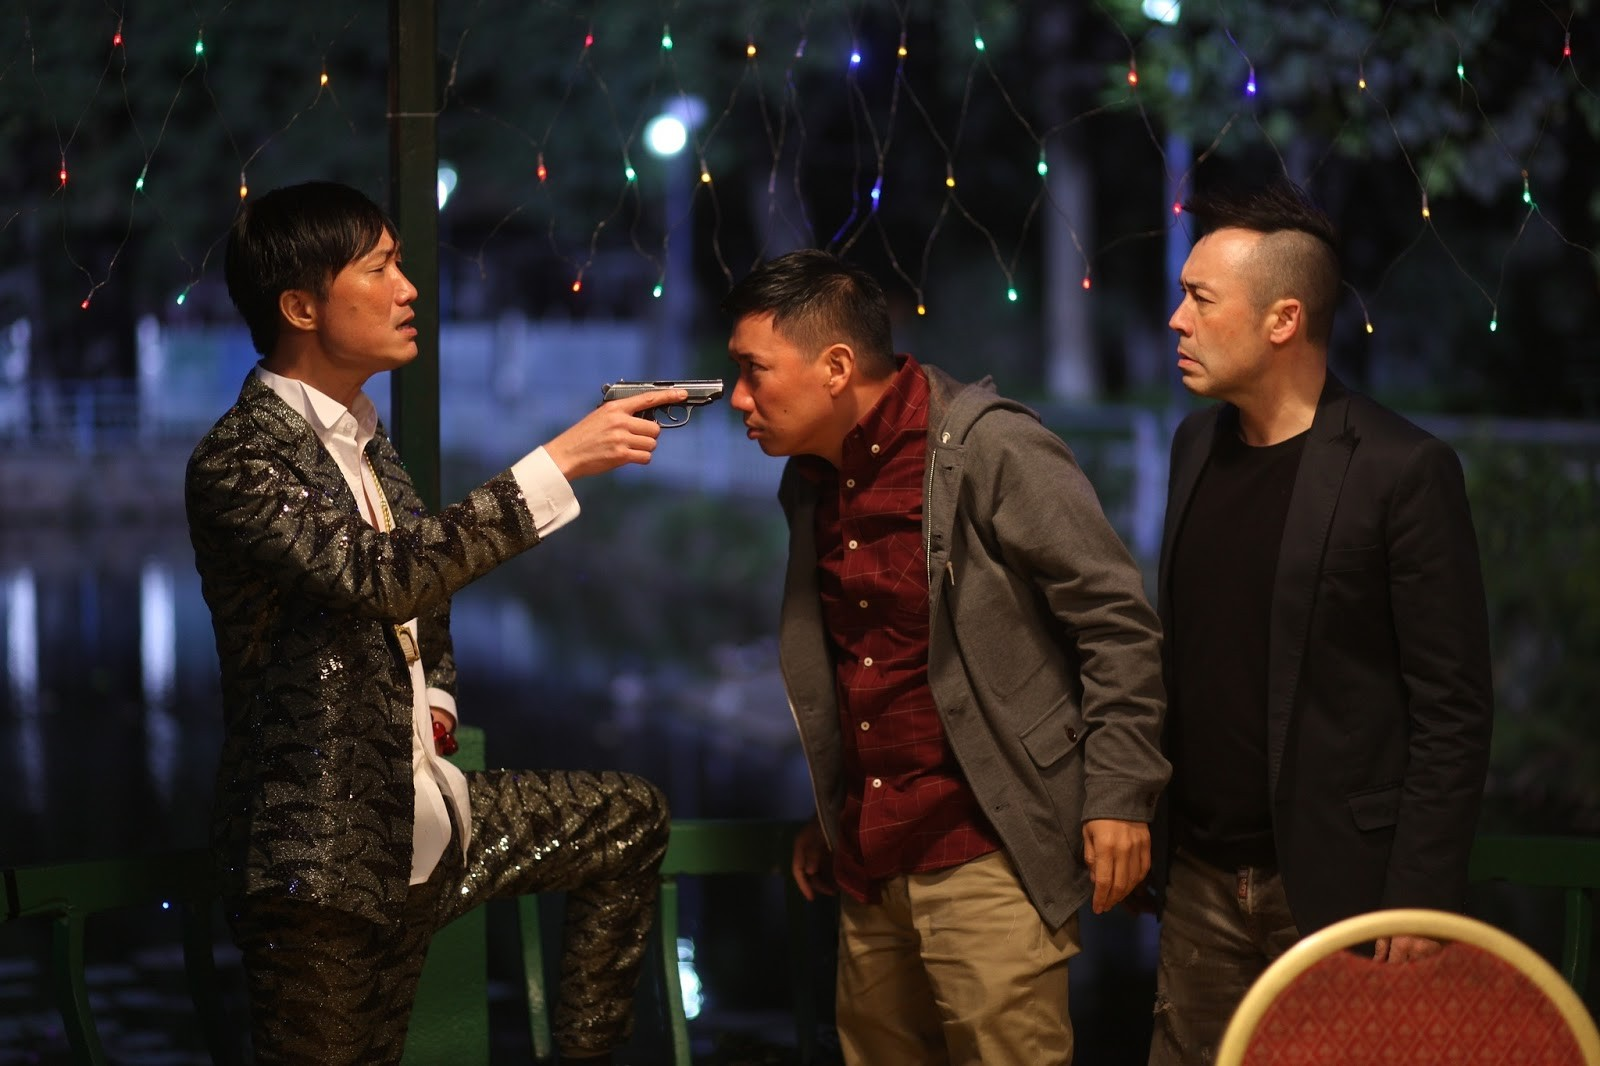 HYPEBEAST 專訪導演彭浩翔:讓觀眾得到共鳴,是電影創作人的責任。